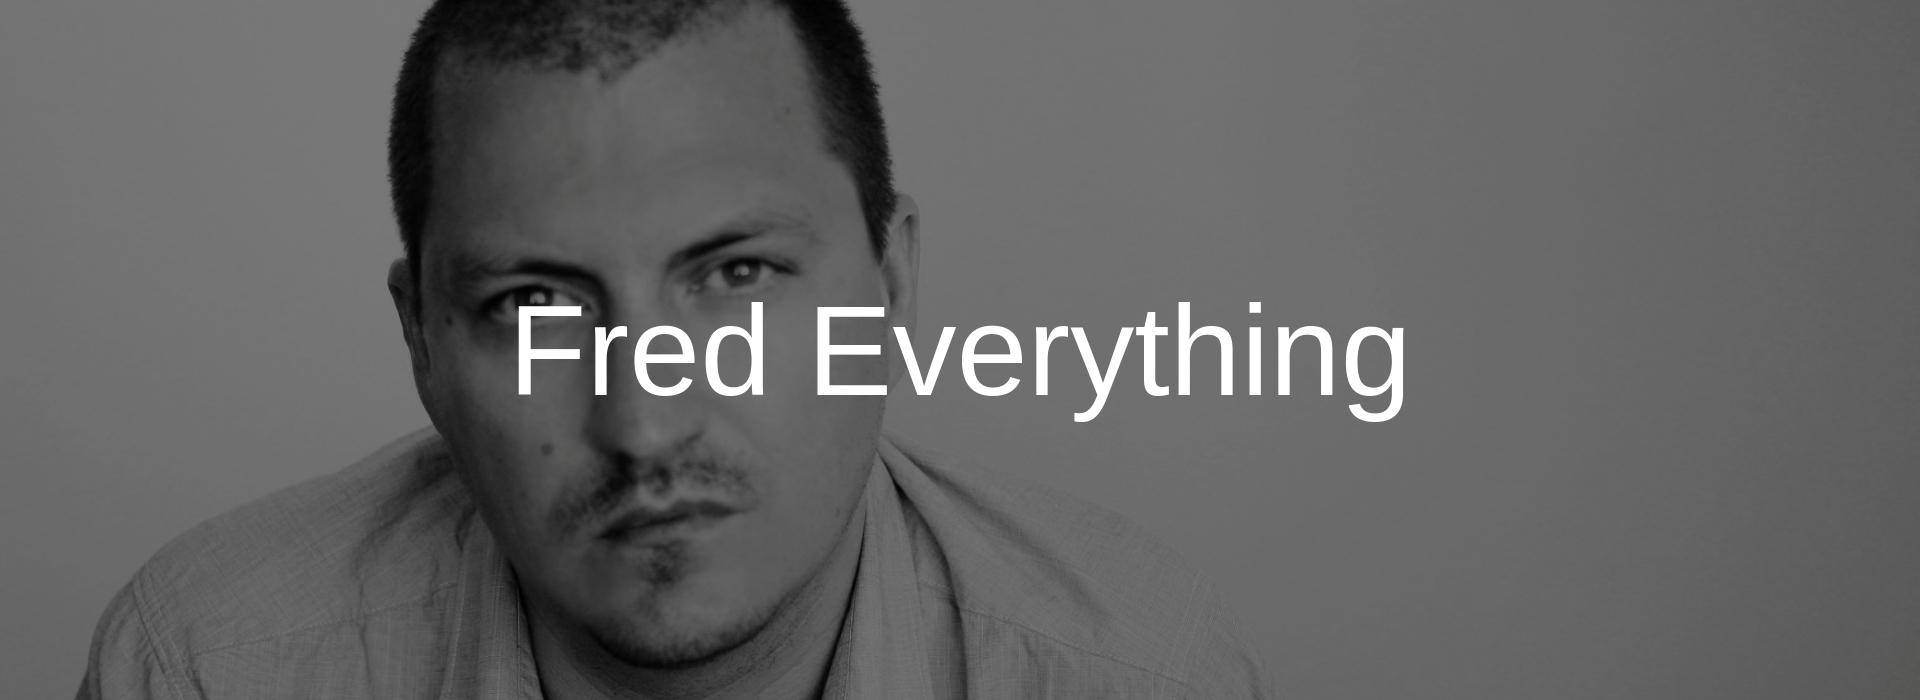 Fred Everything - Pyramind